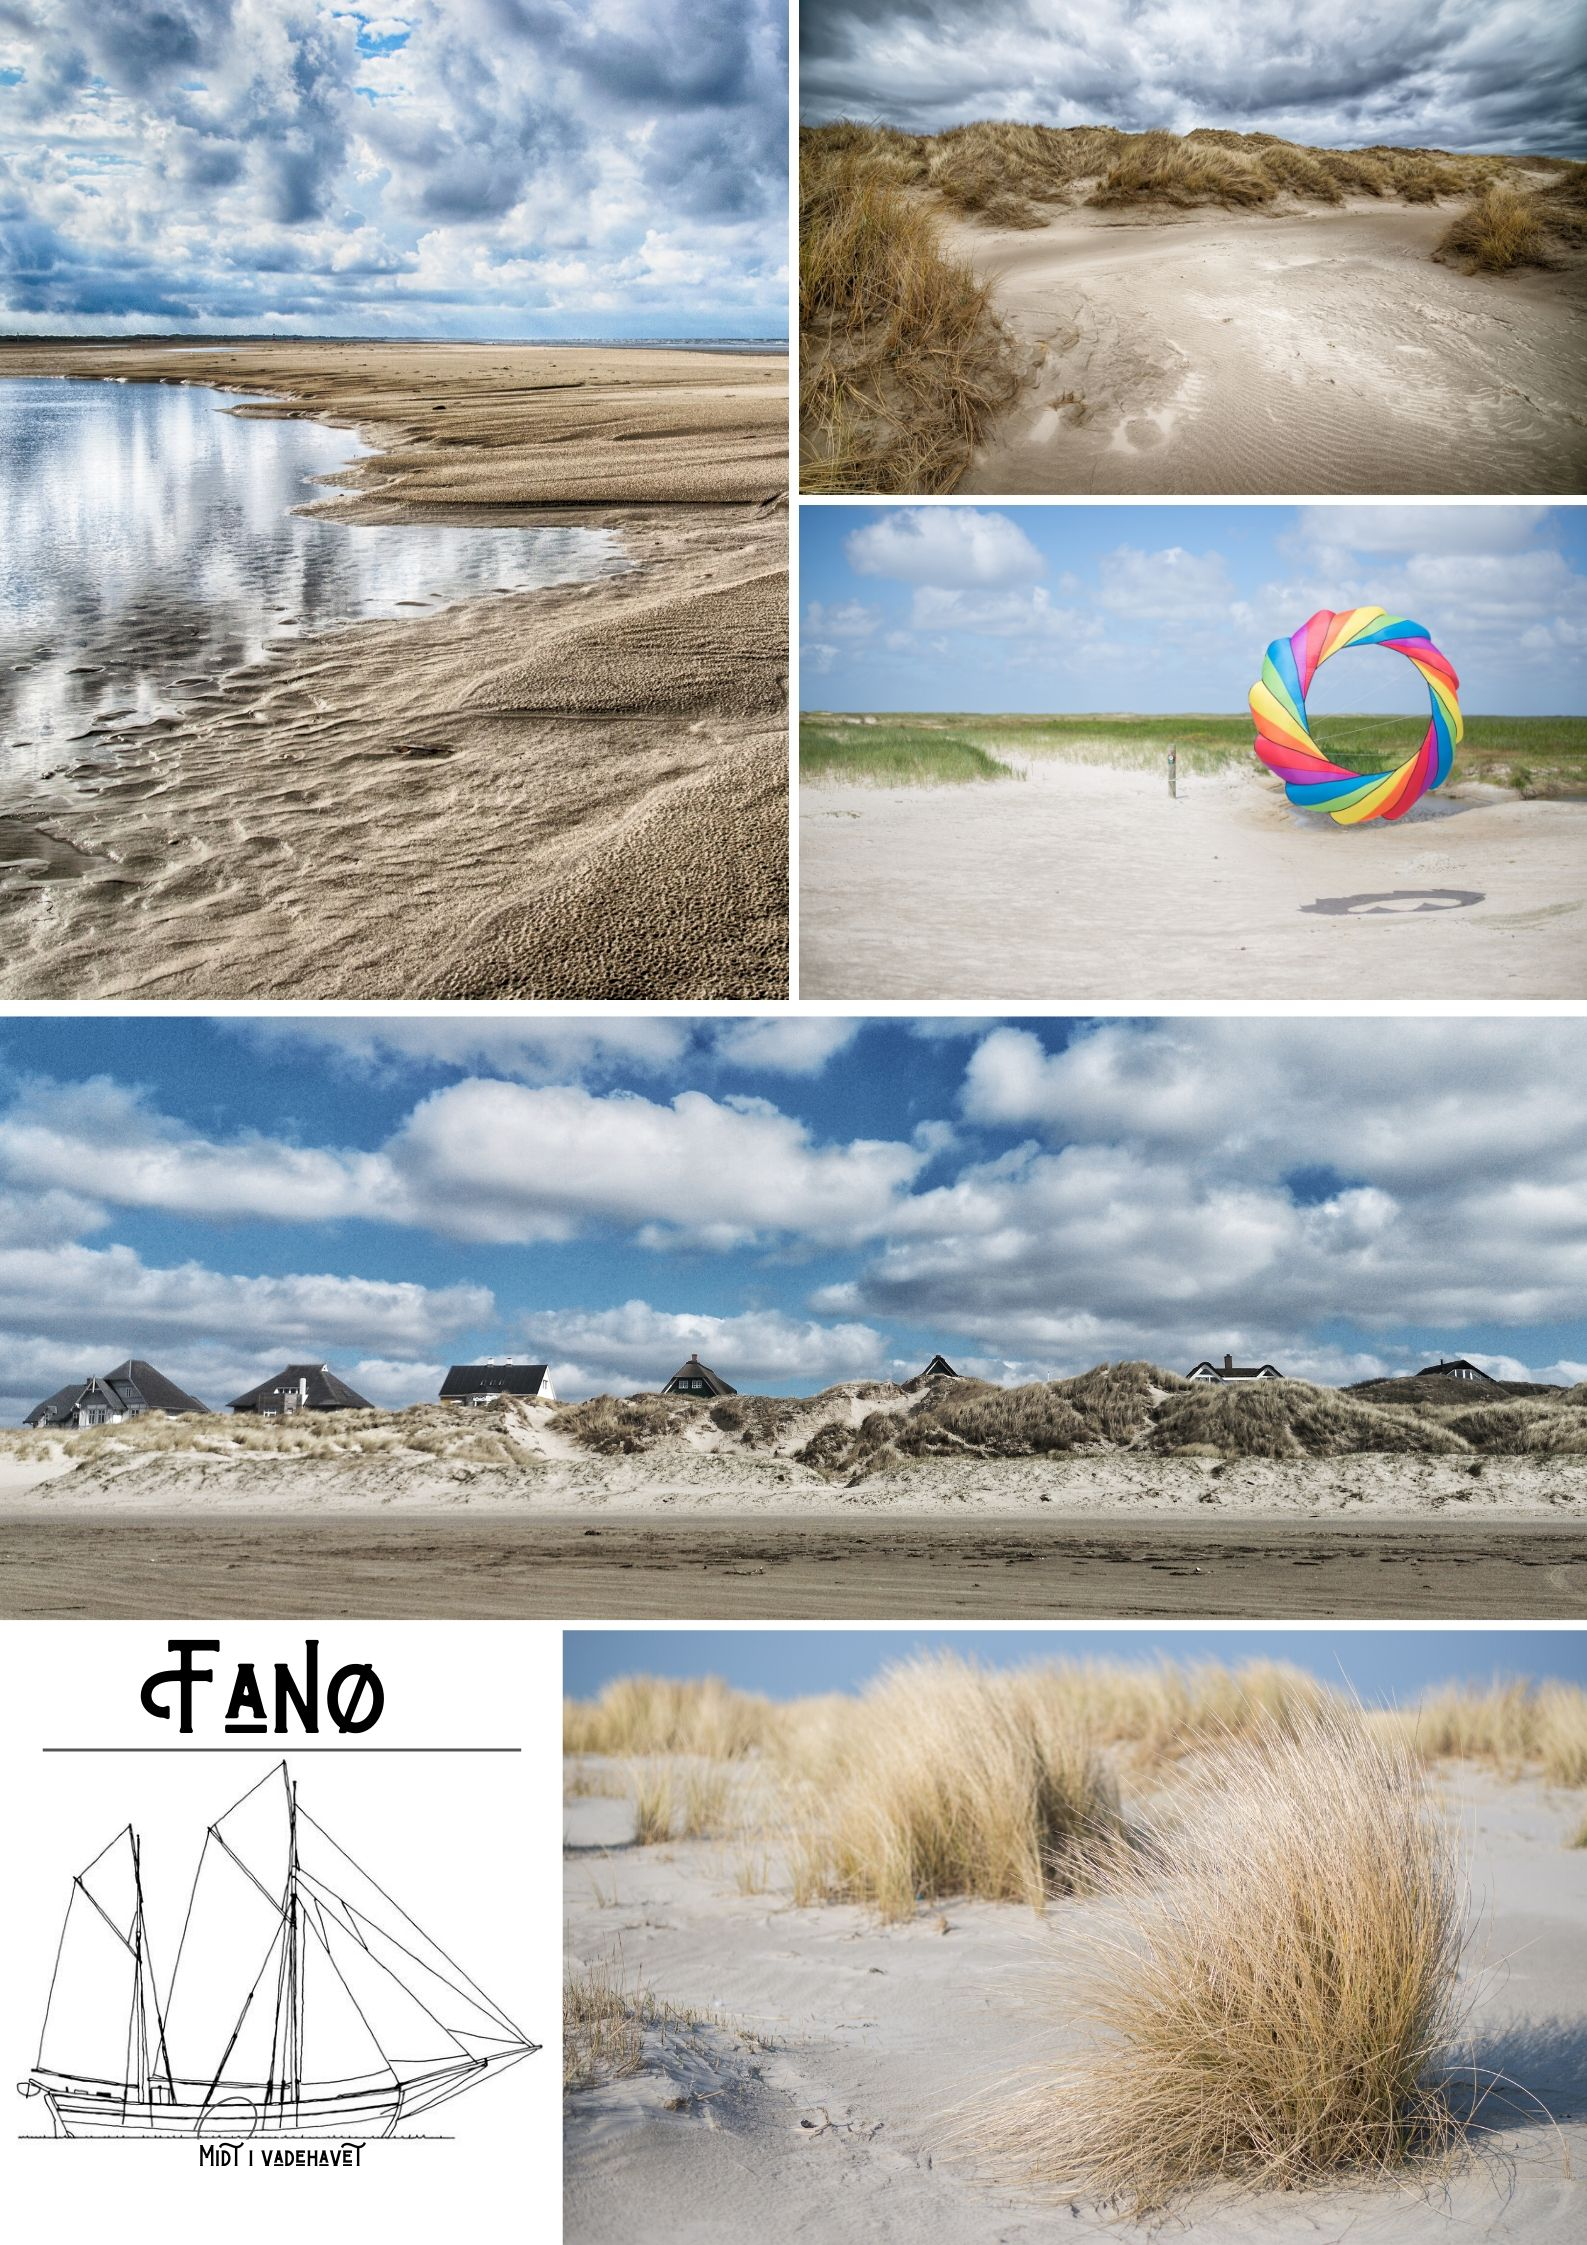 Fanø strand Plakat